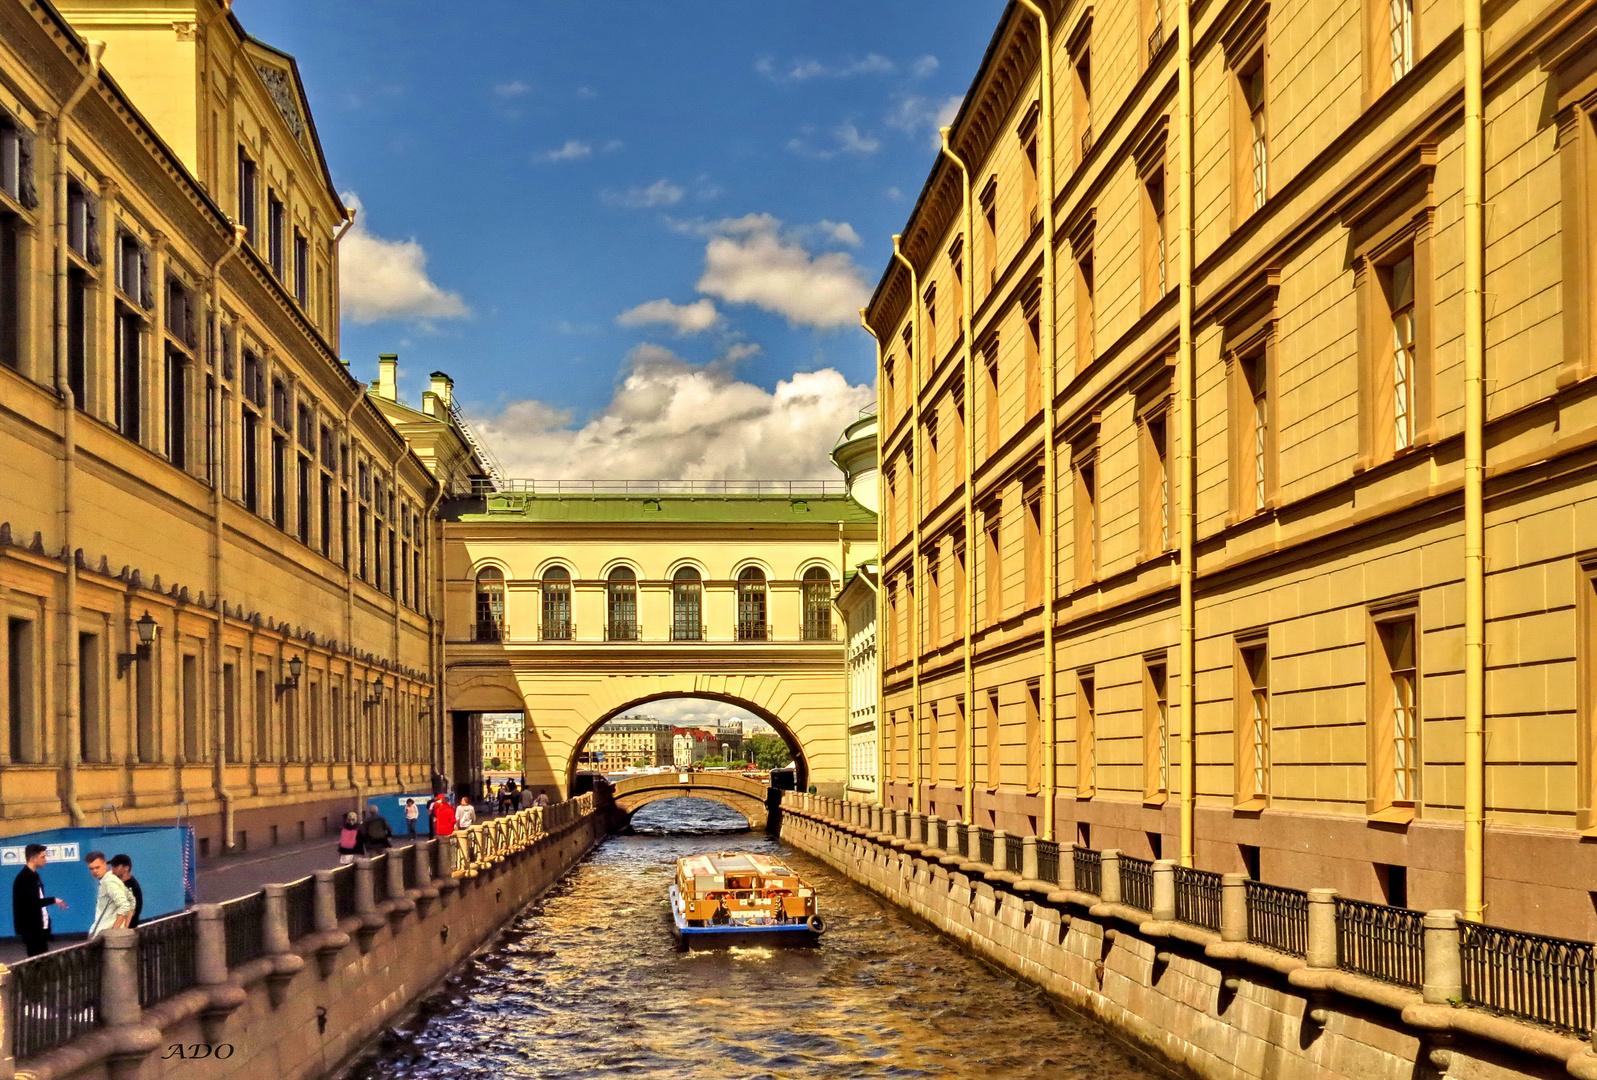 The Bridge of ..... in St. Petersburg